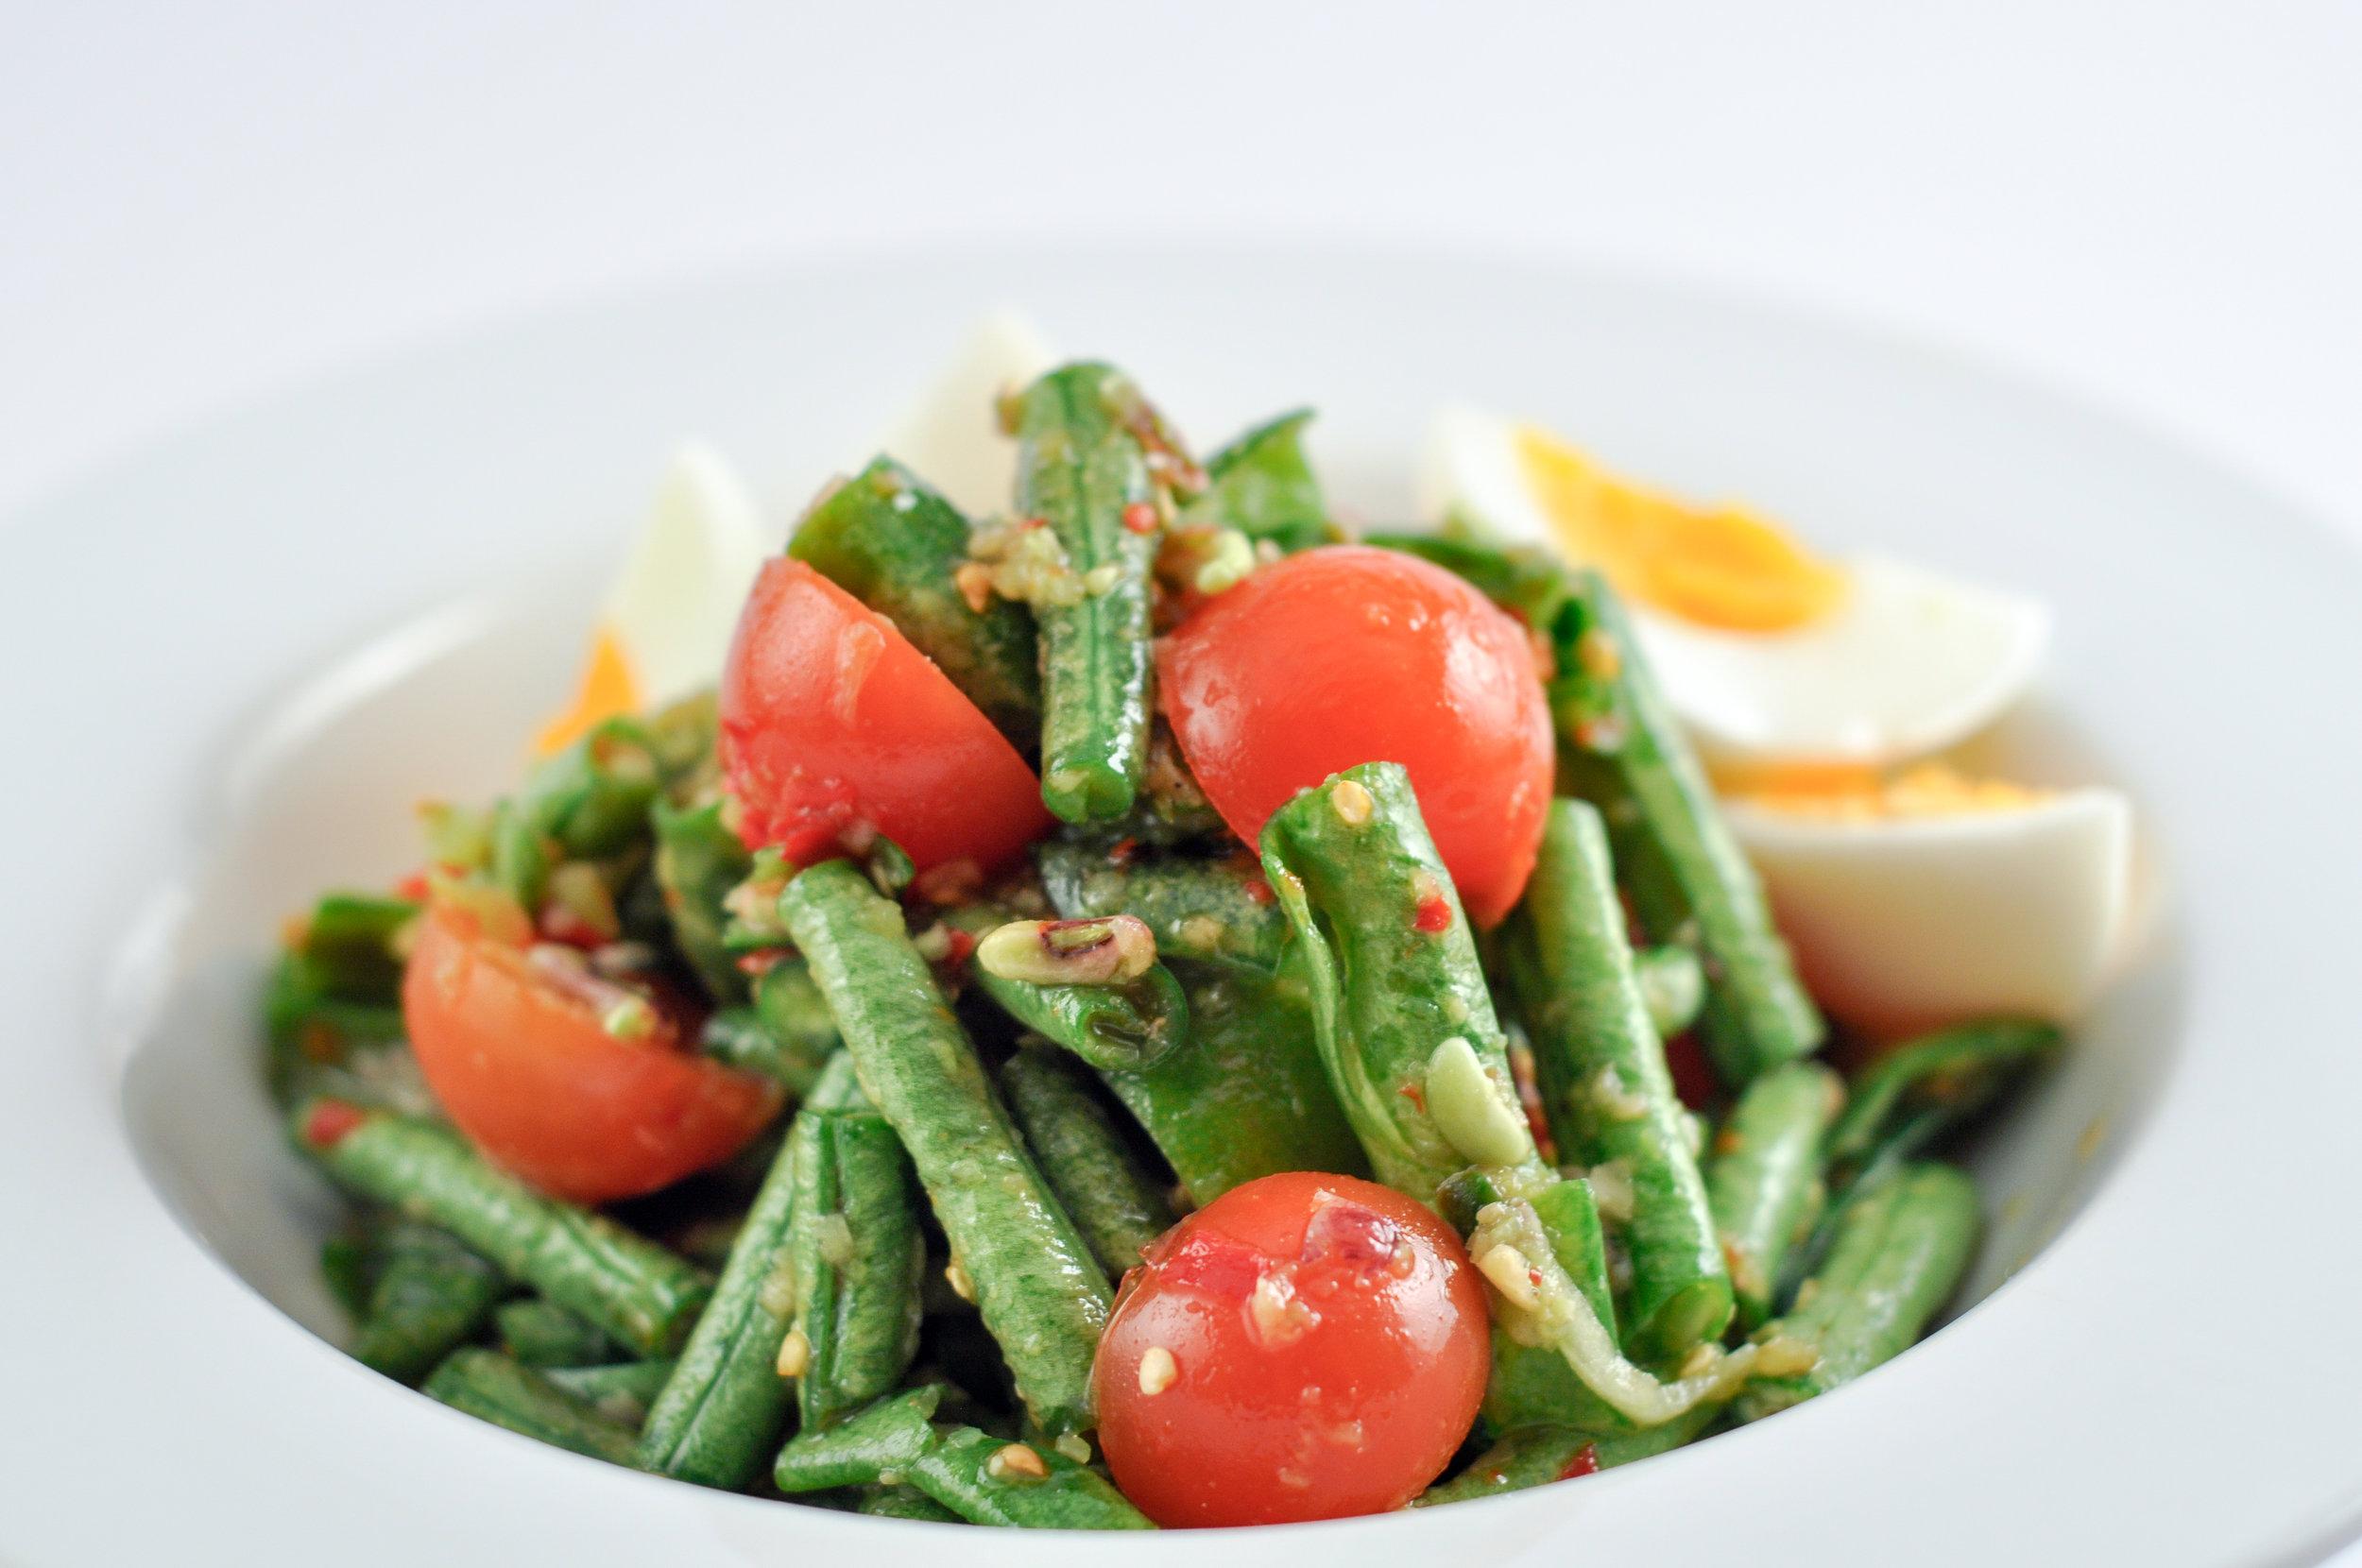 Tum Mark Tua - Snake Bean Salad